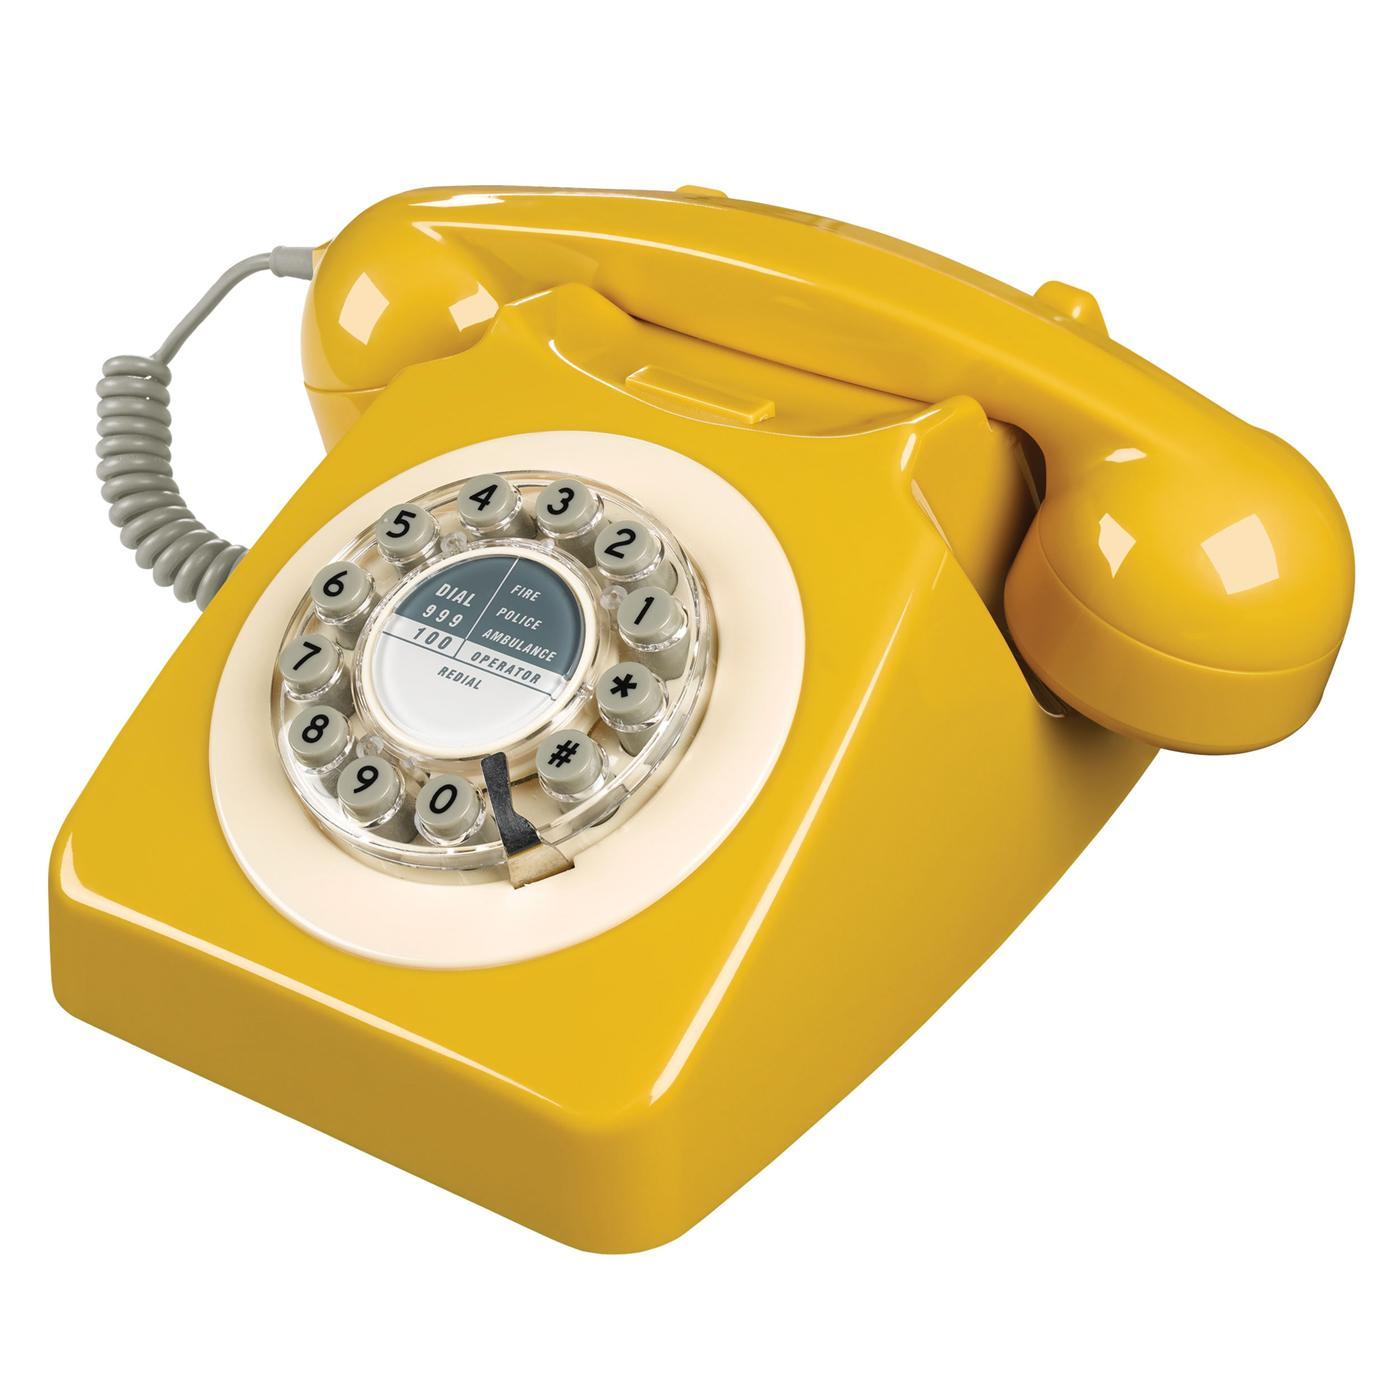 746 Retro Sixties Mod British Retro Telephone EM